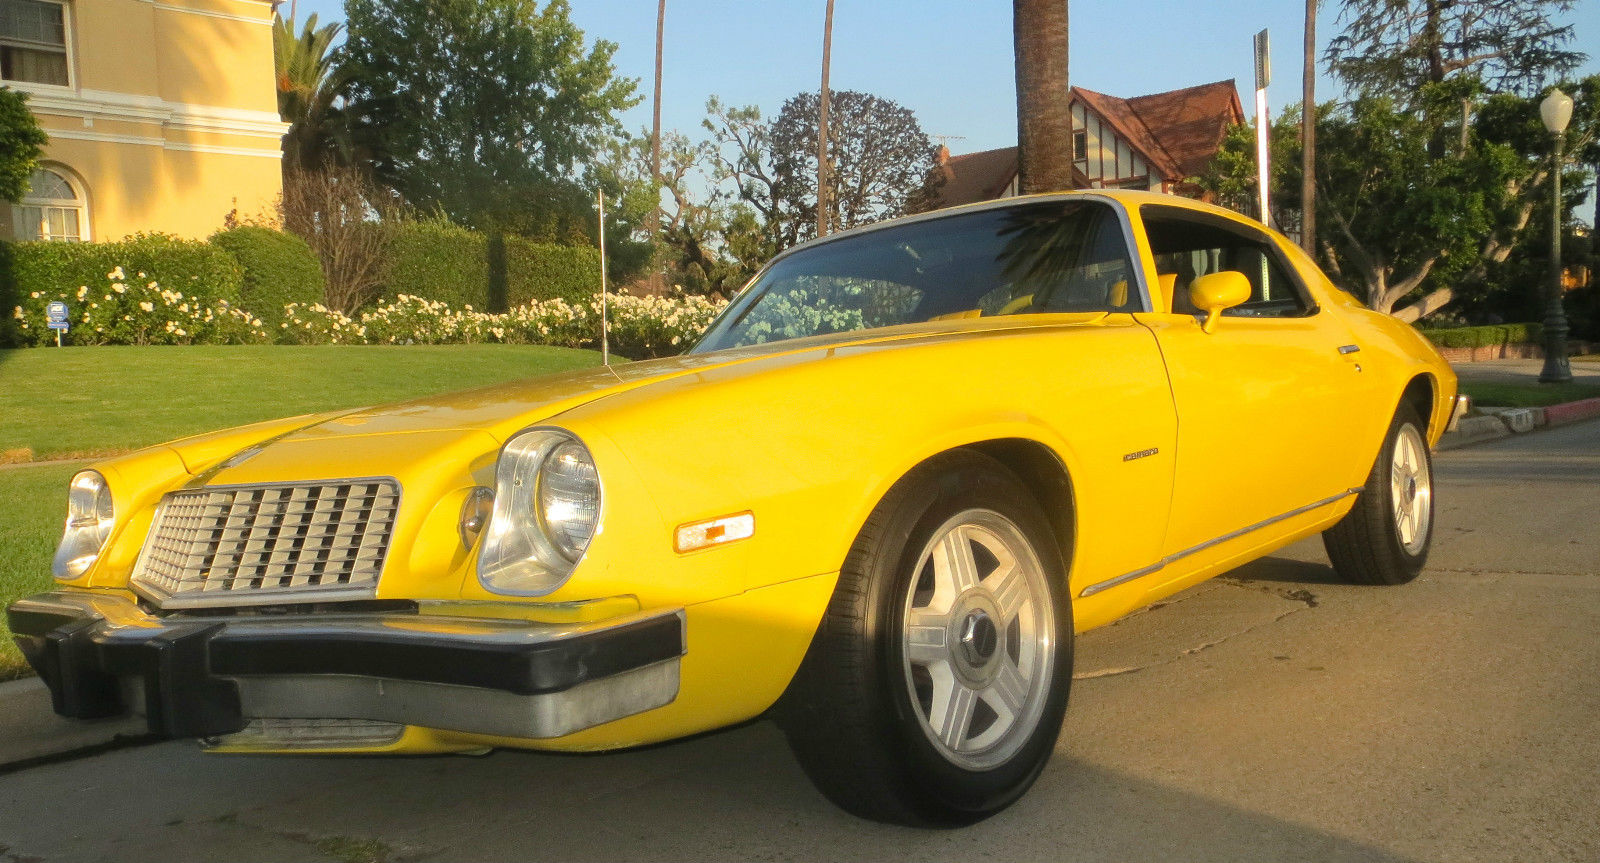 1976 Chevrolet Camaro Lt 57l 350 Daytona Yellow Muscle Car Chevy V8 5 7l Engine Diagram Lt33